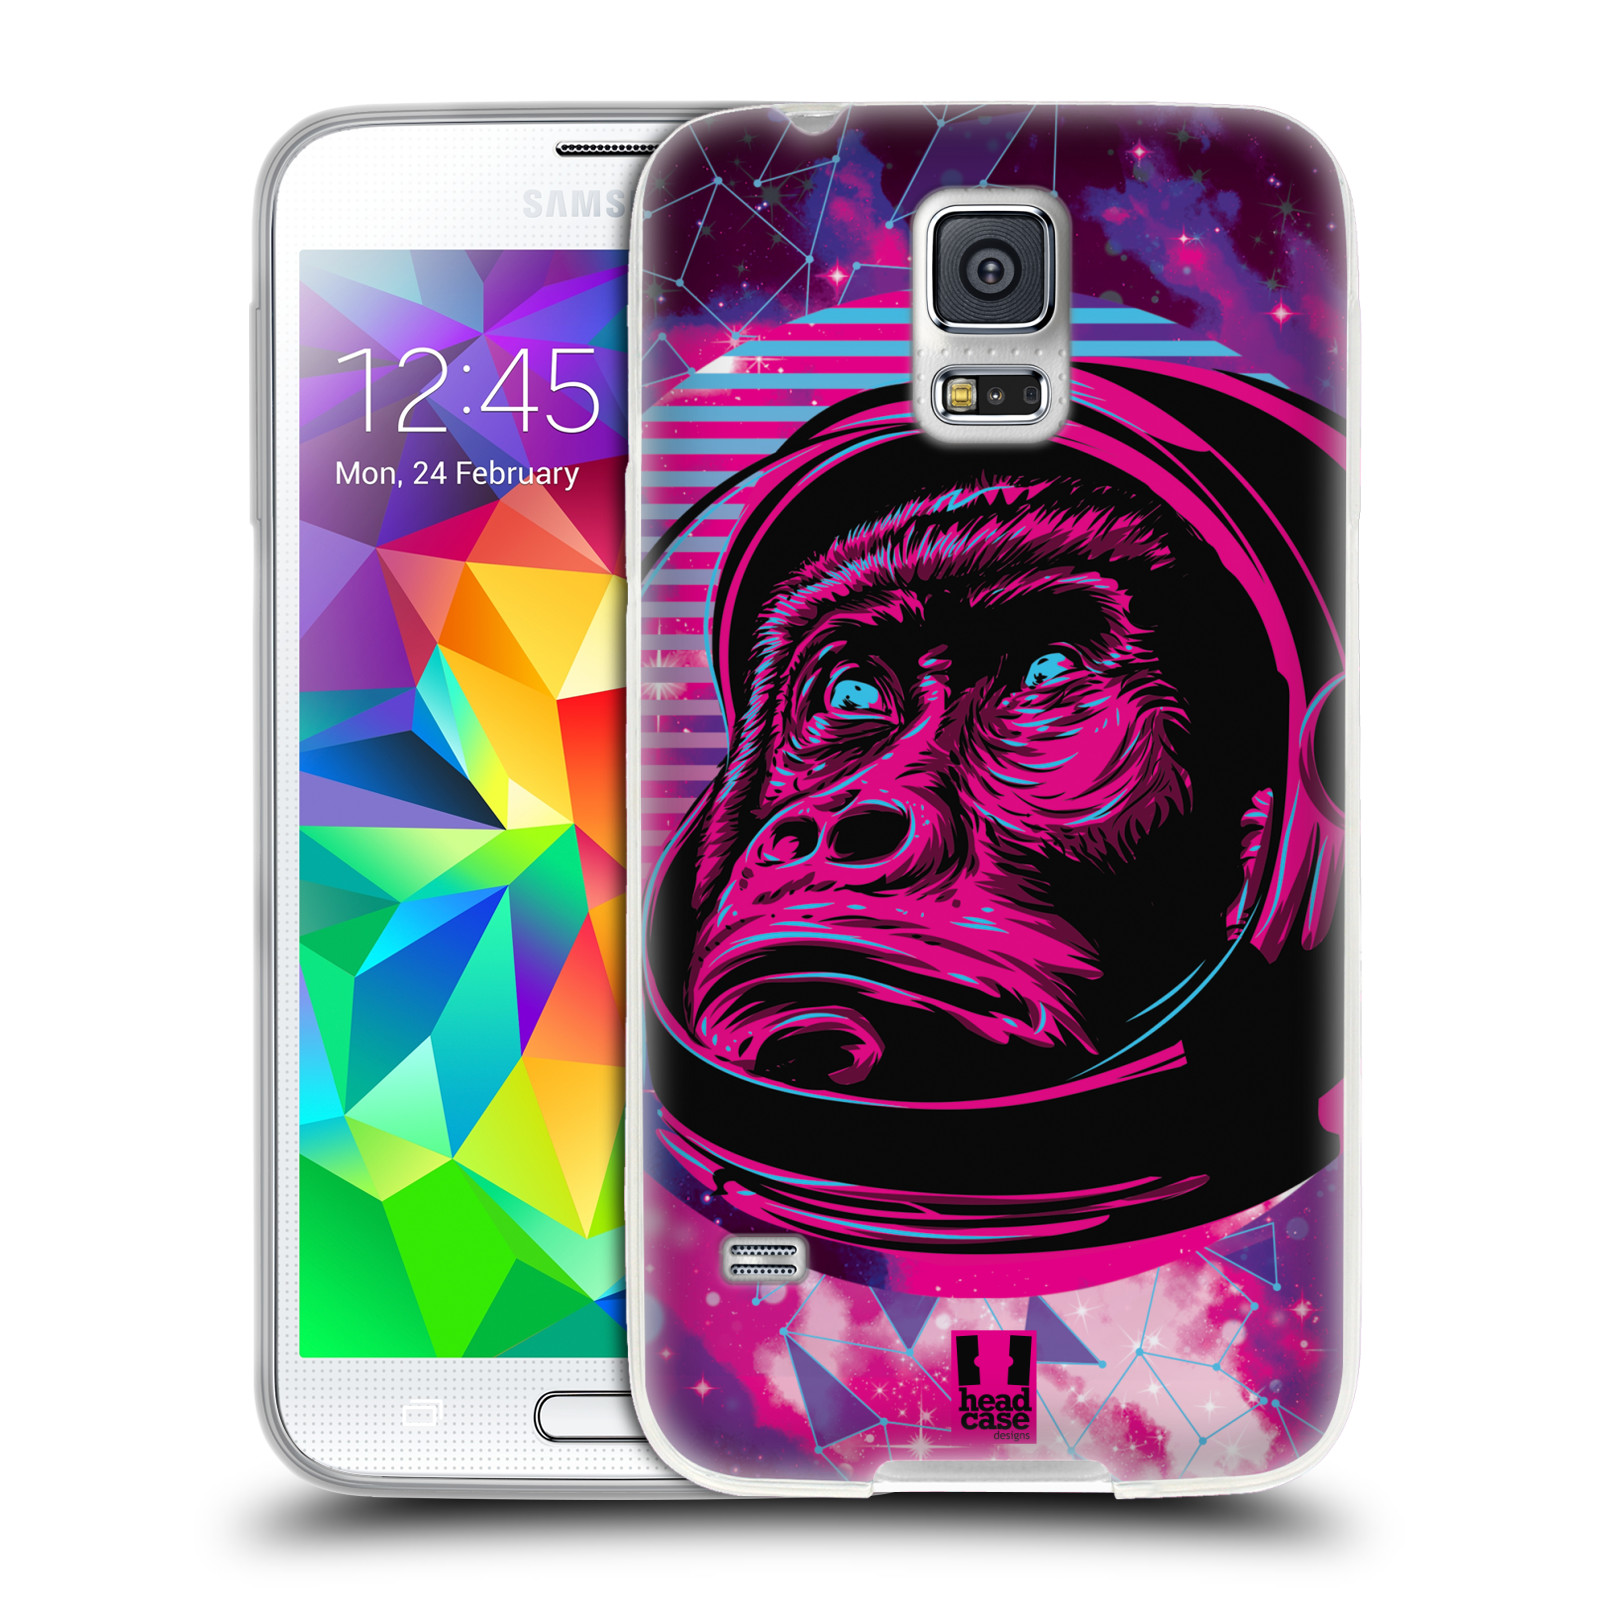 Silikonové pouzdro na mobil Samsung Galaxy S5 Head Case - Gorila ve skafandru